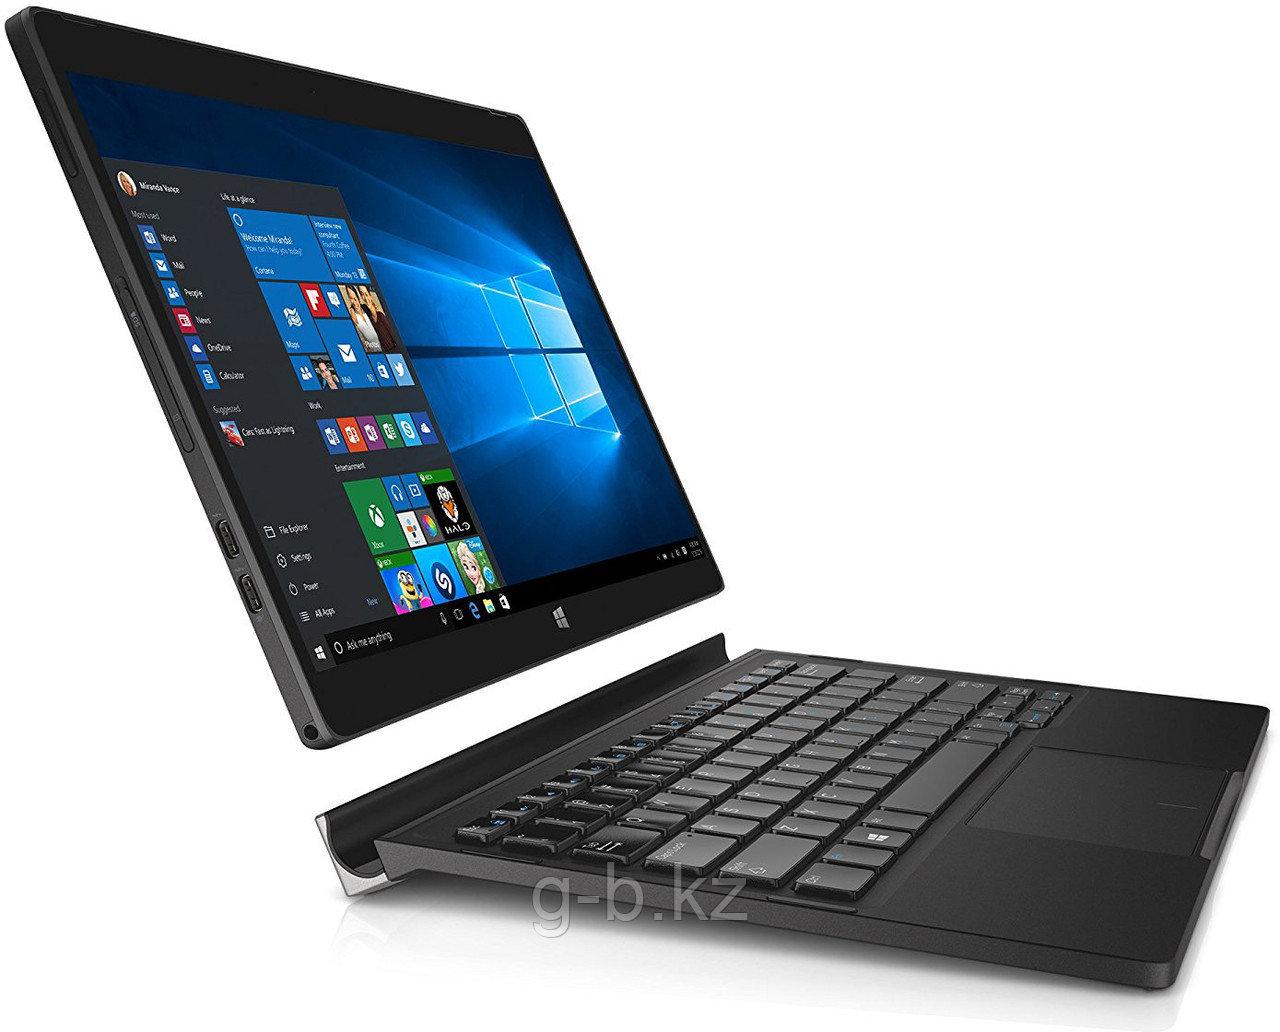 Ноутбук Dell 12,5 ''/Latitude 7275 /Intel  Core  m5-6Y57  2,8 GHz